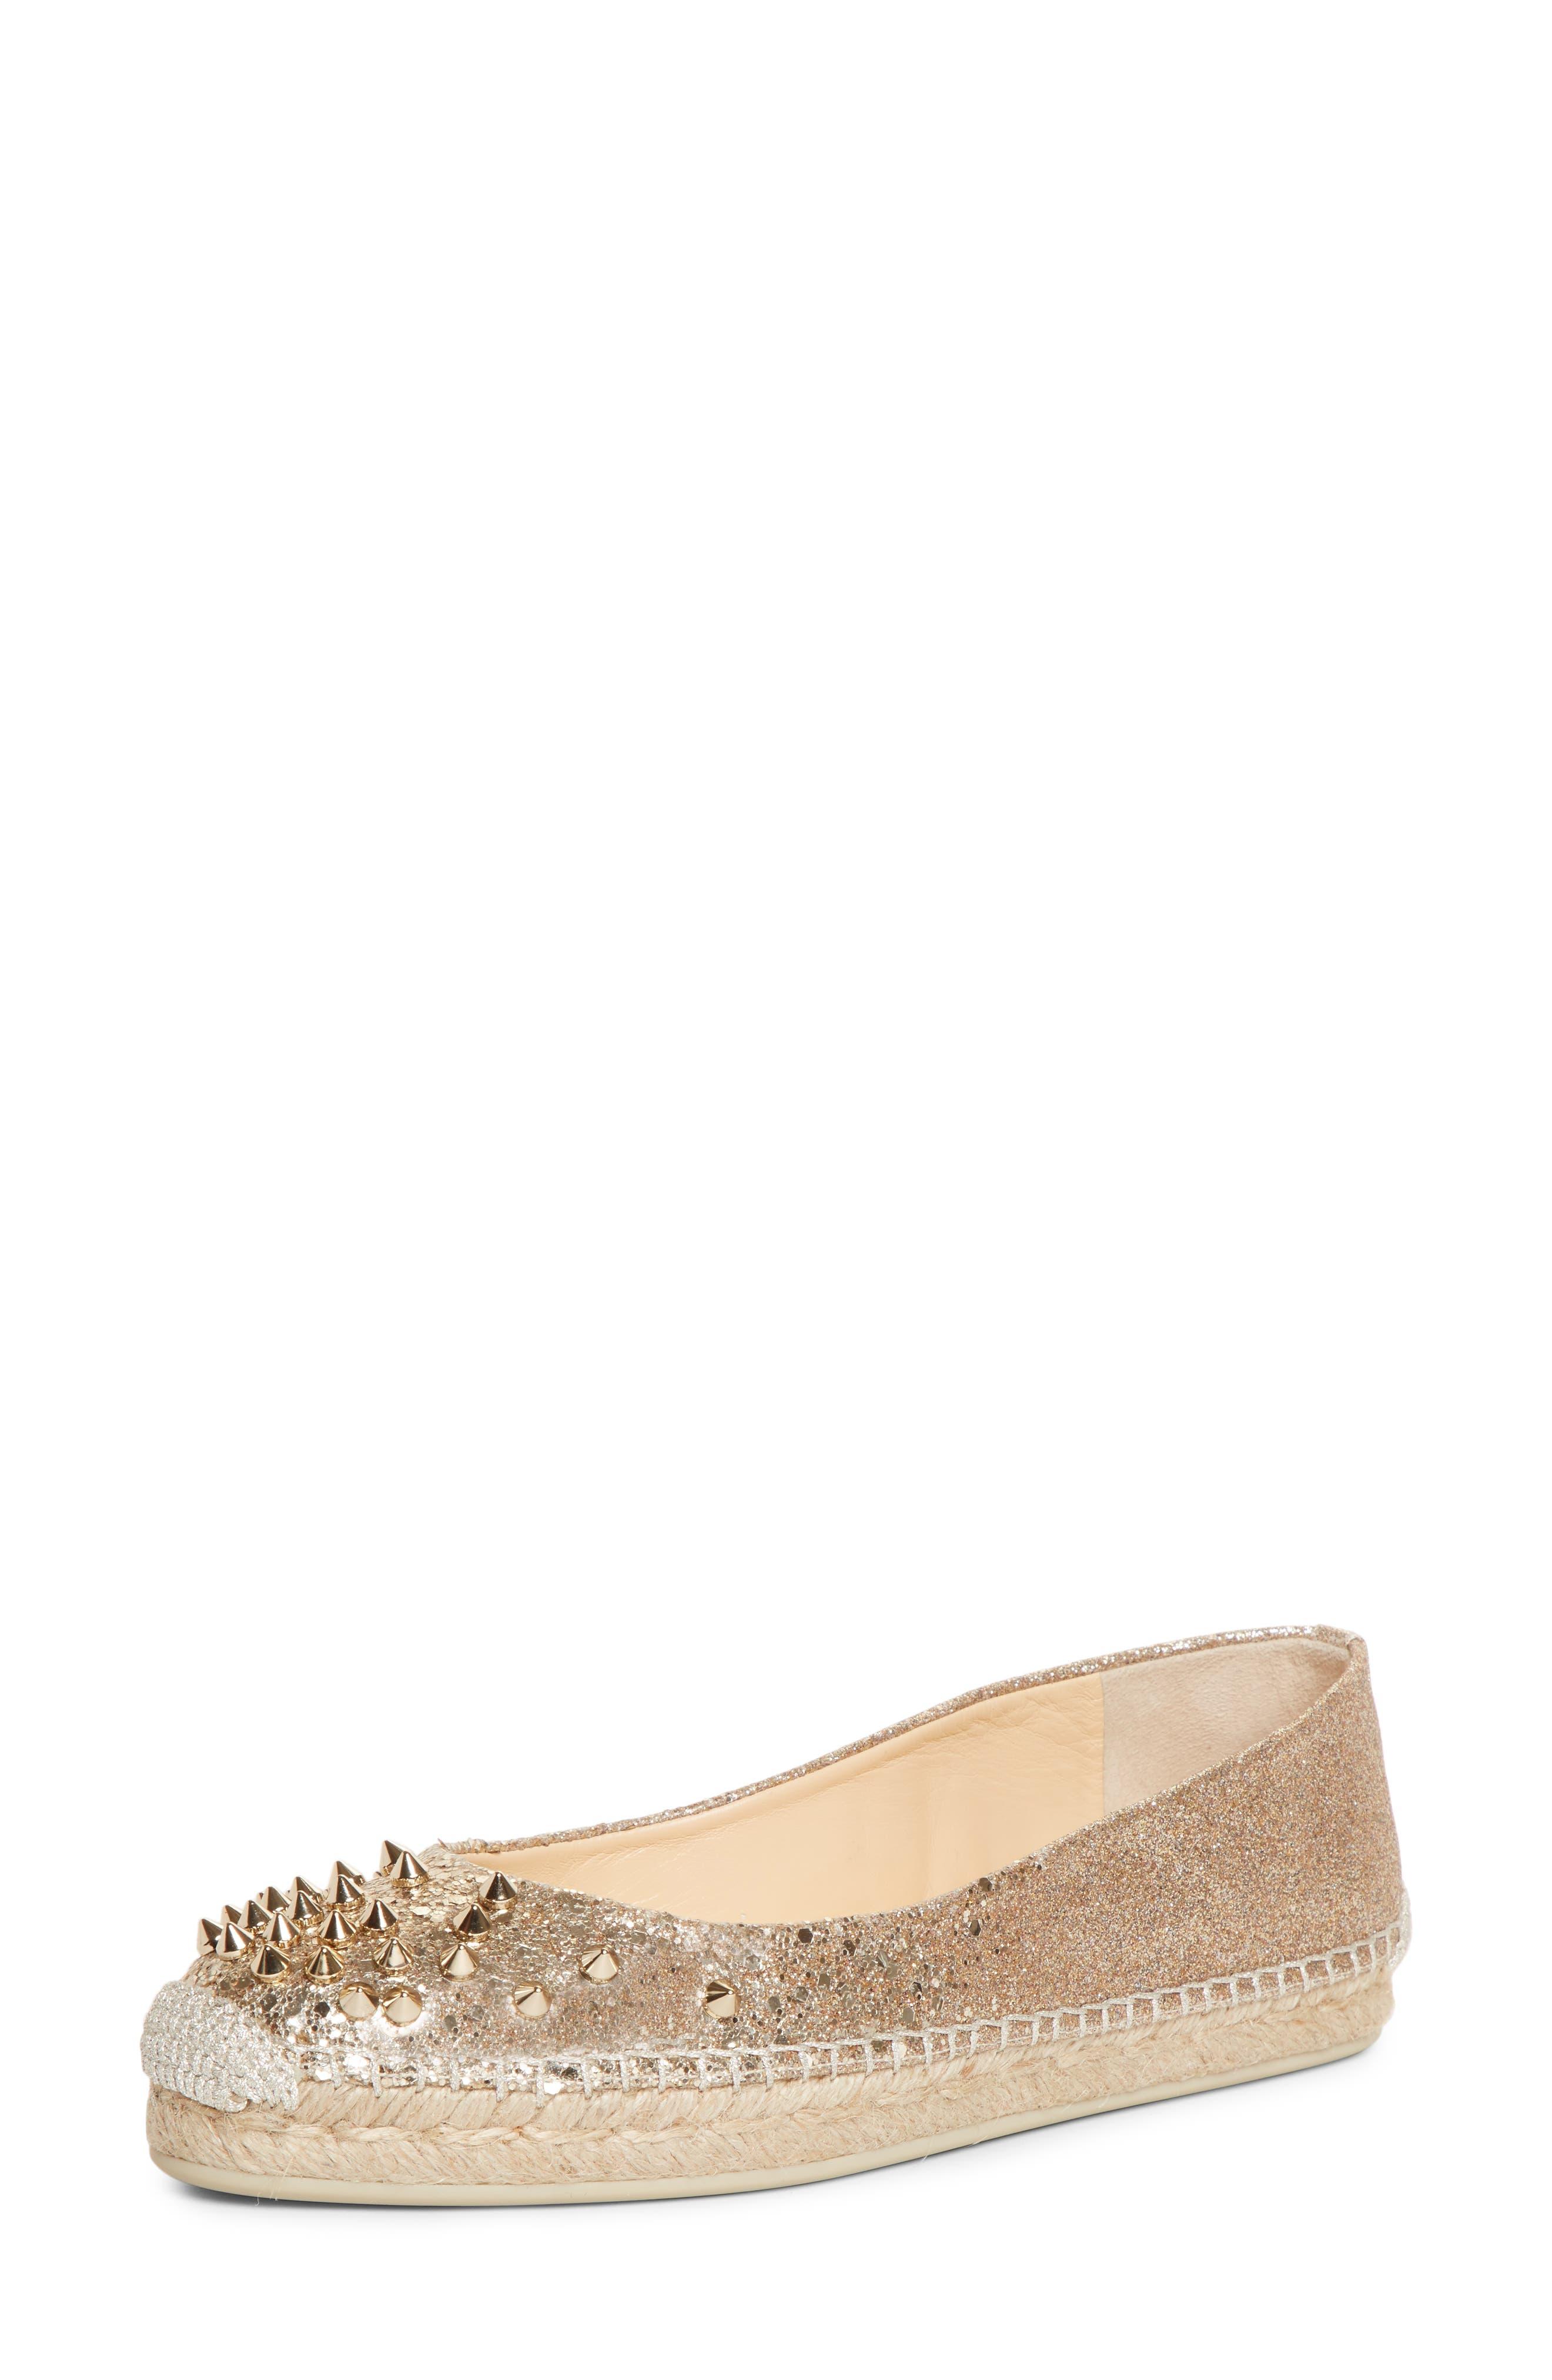 edbfa2bd14c christian louboutin espadrilles sandals for women - Buy best women's ...